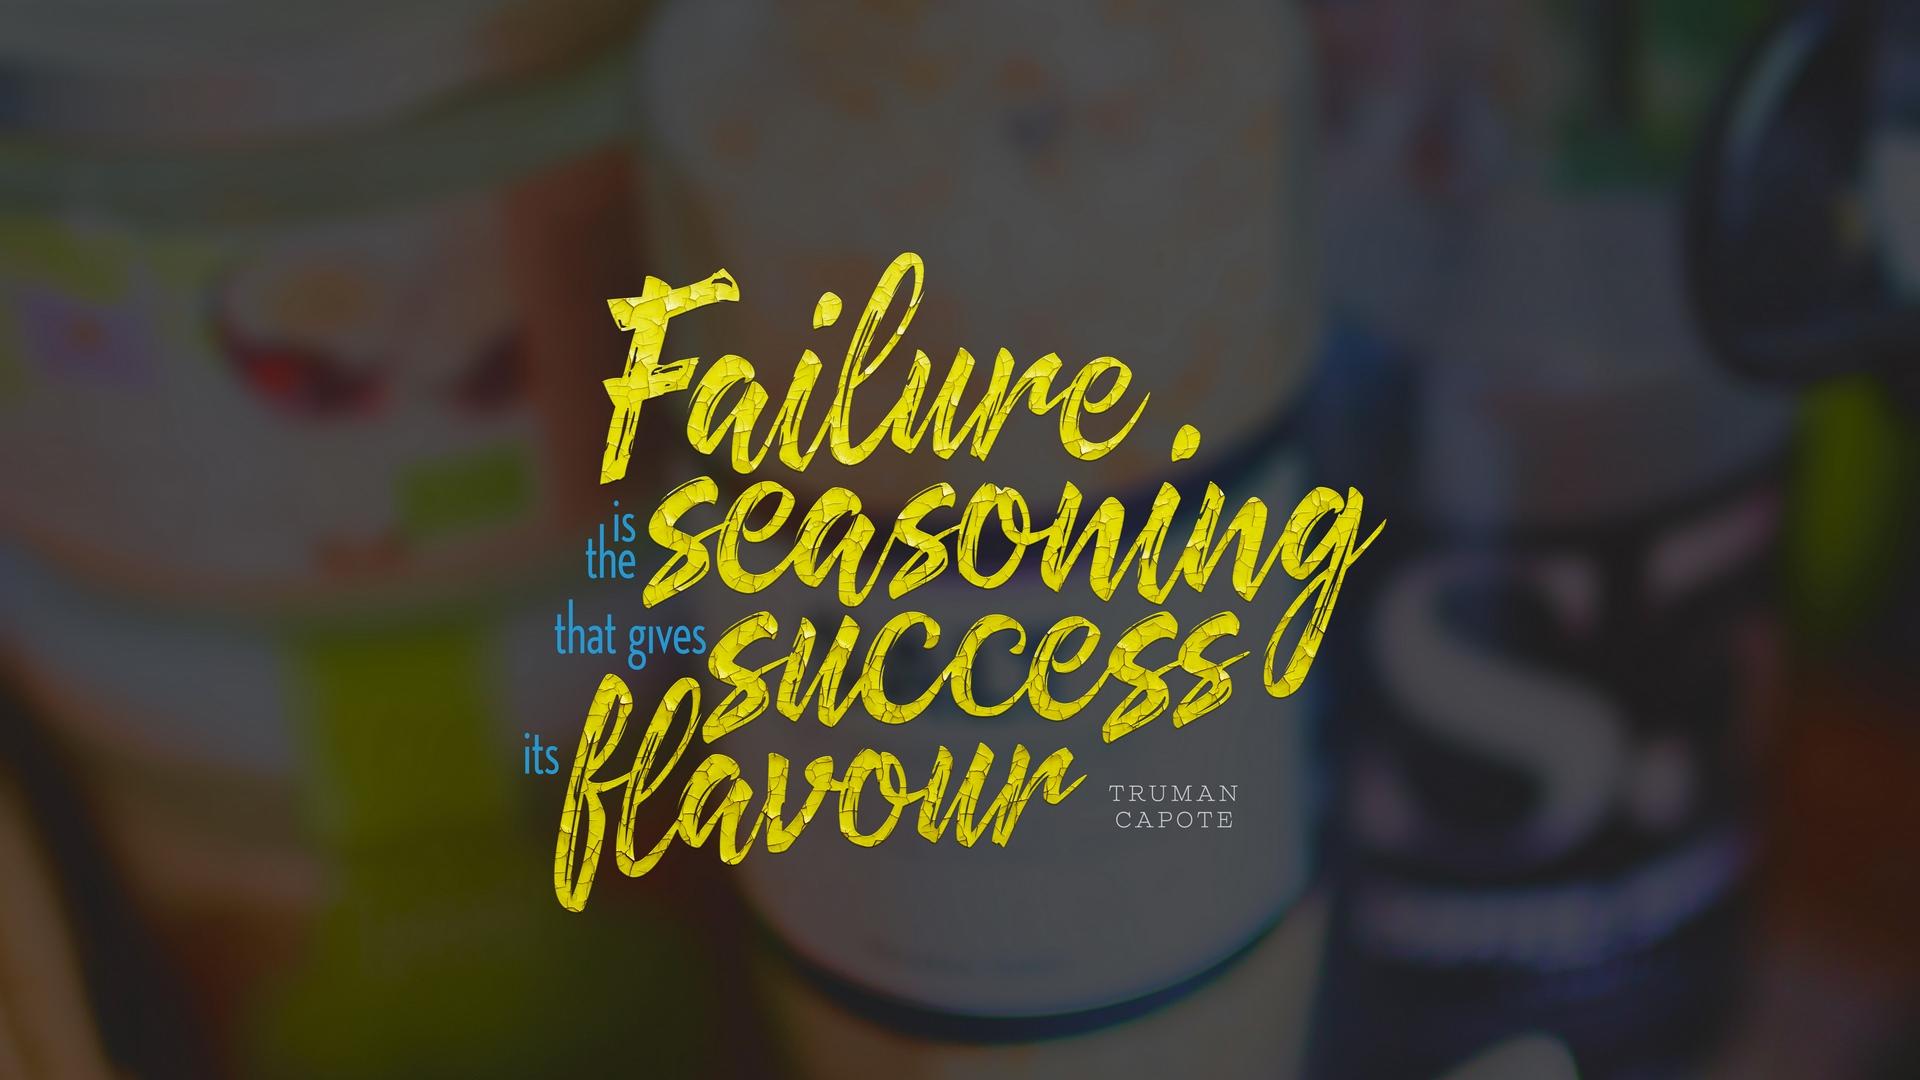 Wallpaper Quote, Motivation, Inspiration, Failure, - Inspirational Quotes For Desktop Wallpaper Hd - HD Wallpaper